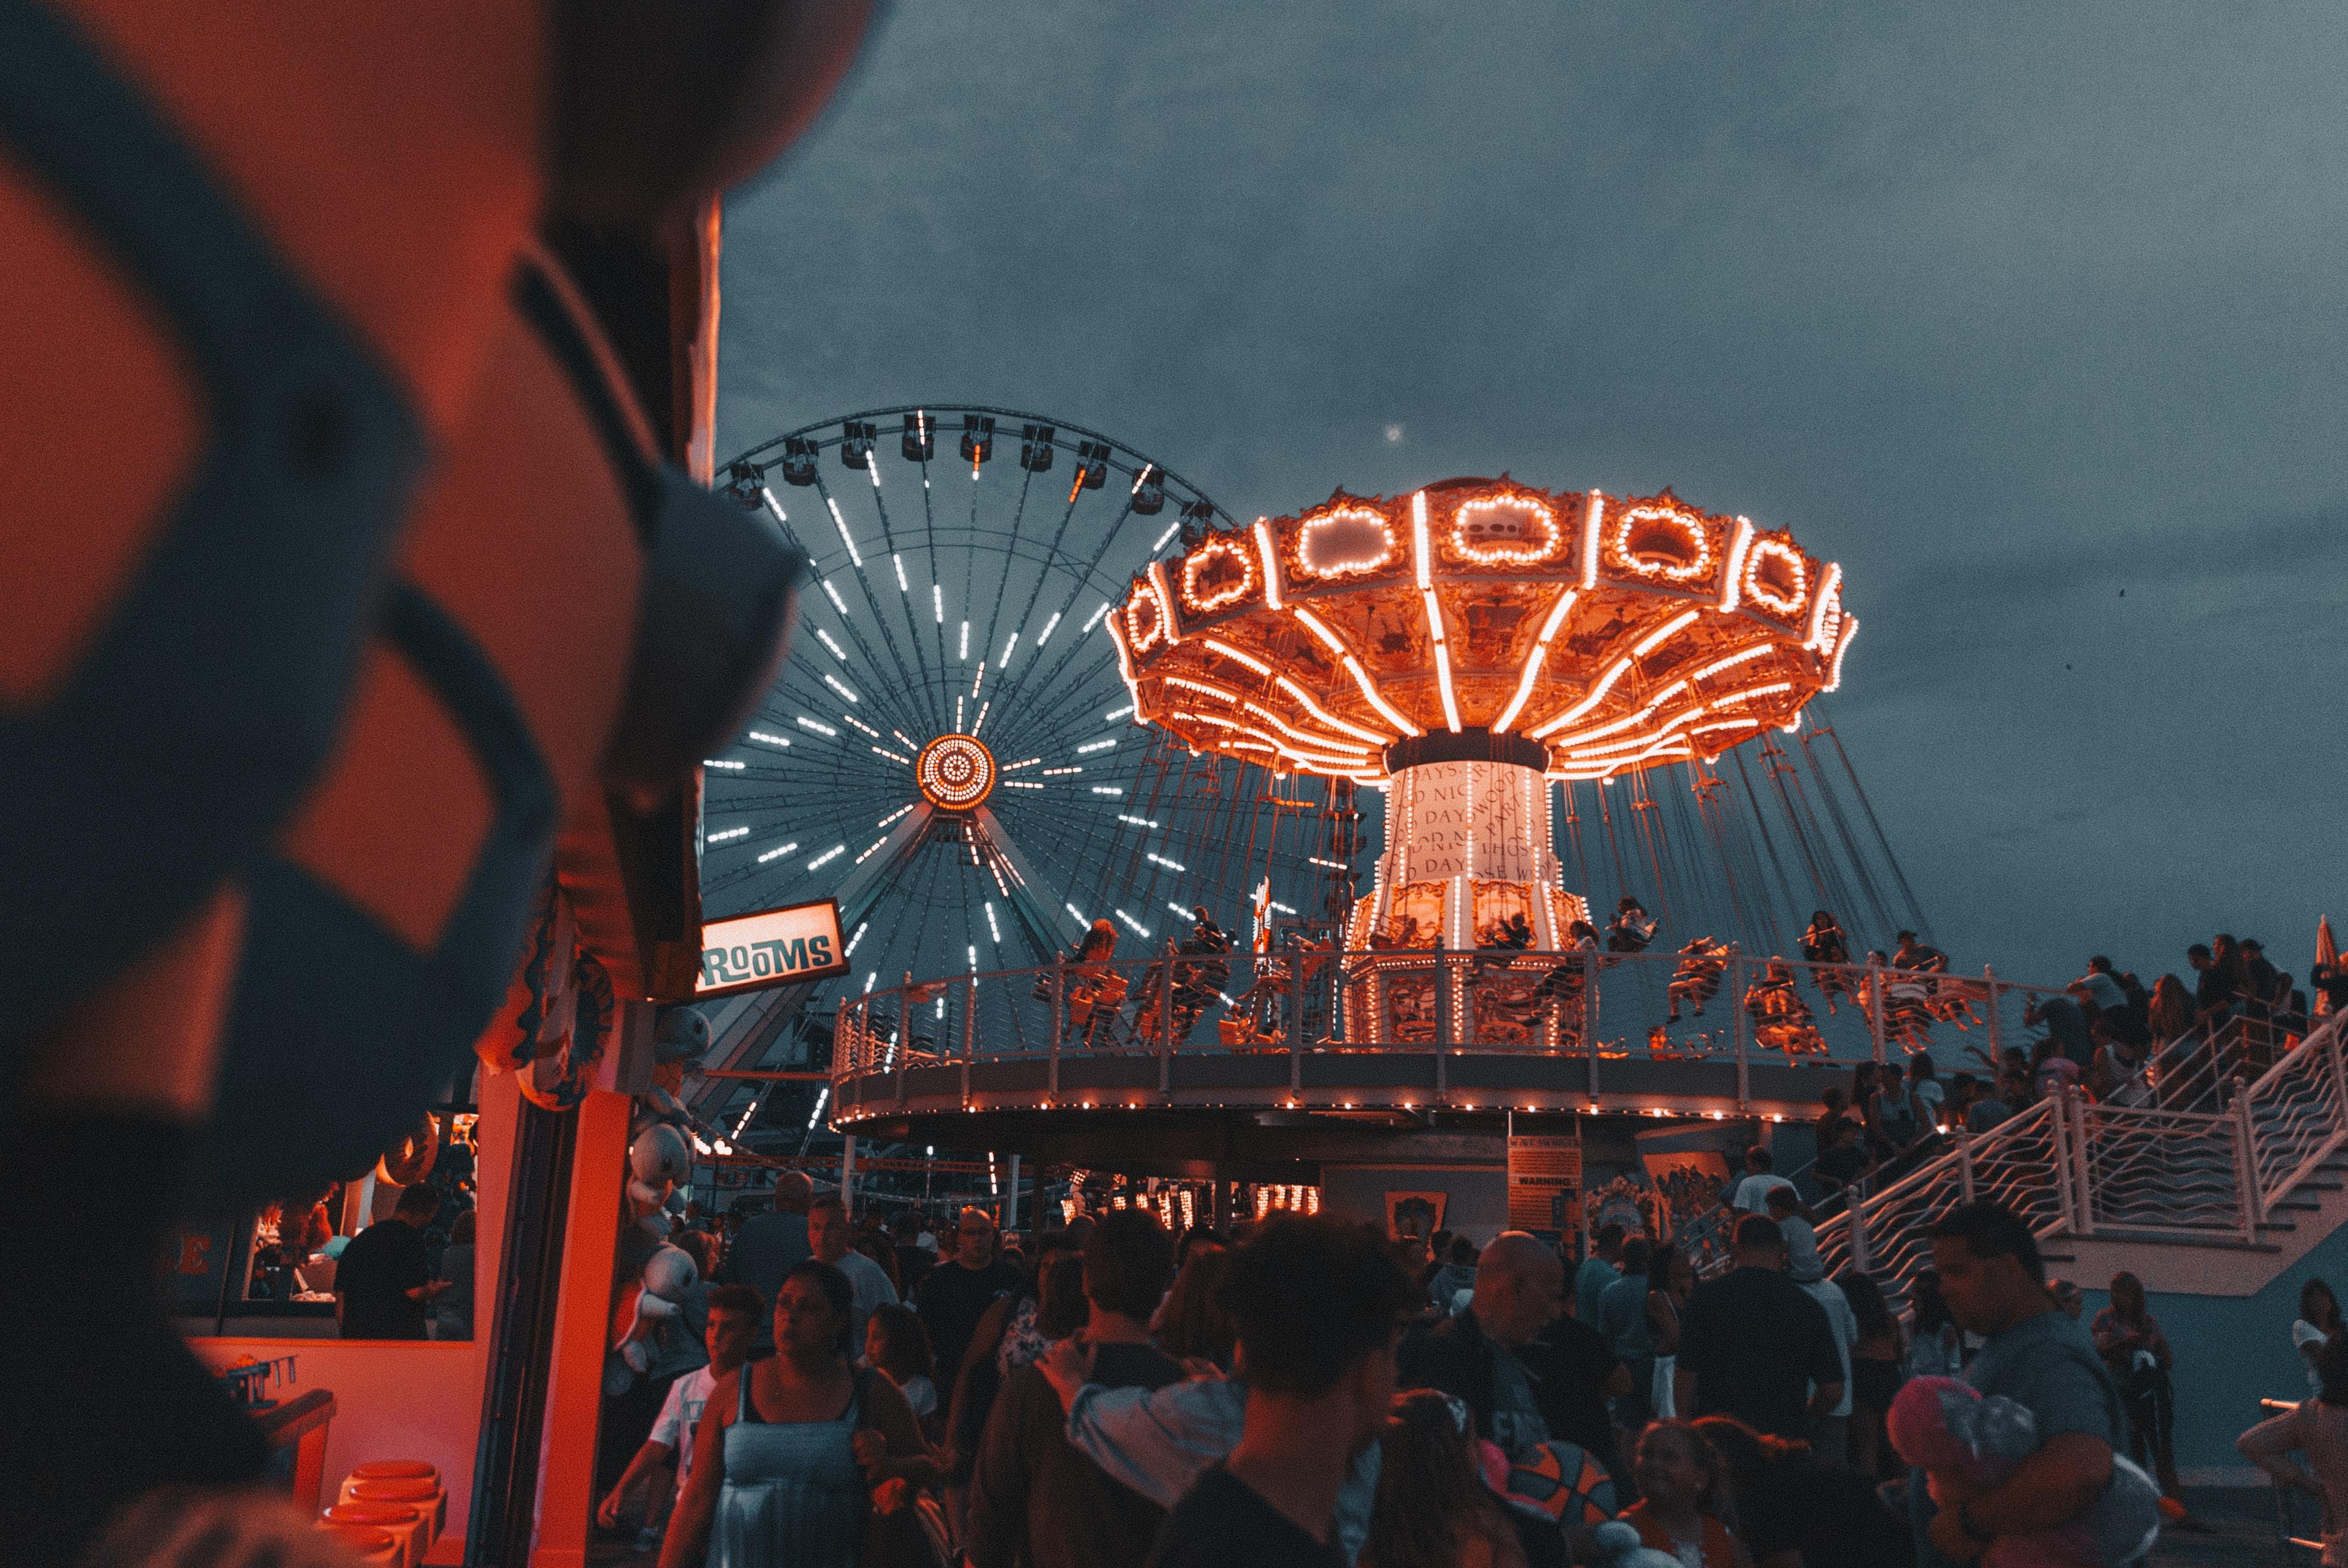 Crowd enjoying Wildwood boardwalk amusement park with swing ride and Ferris Wheel glowing in the night